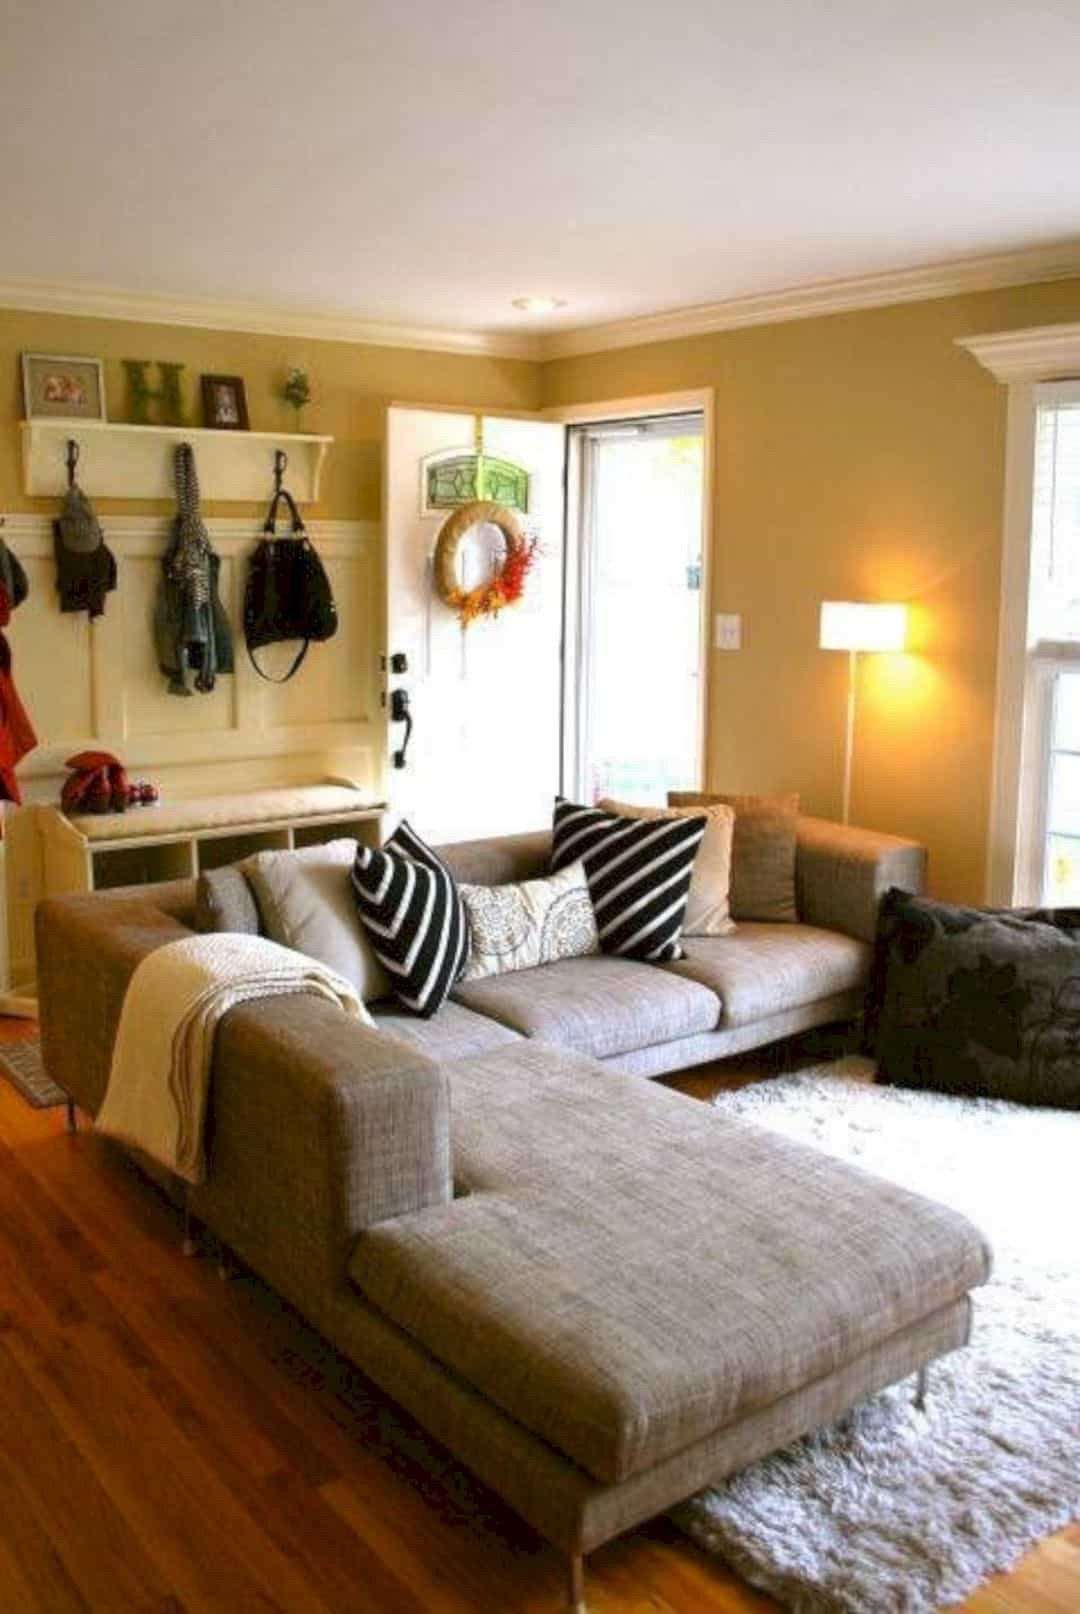 Simple Living Room Decorating Ideas Luxury 16 Simple Interior Design Ideas for Living Room